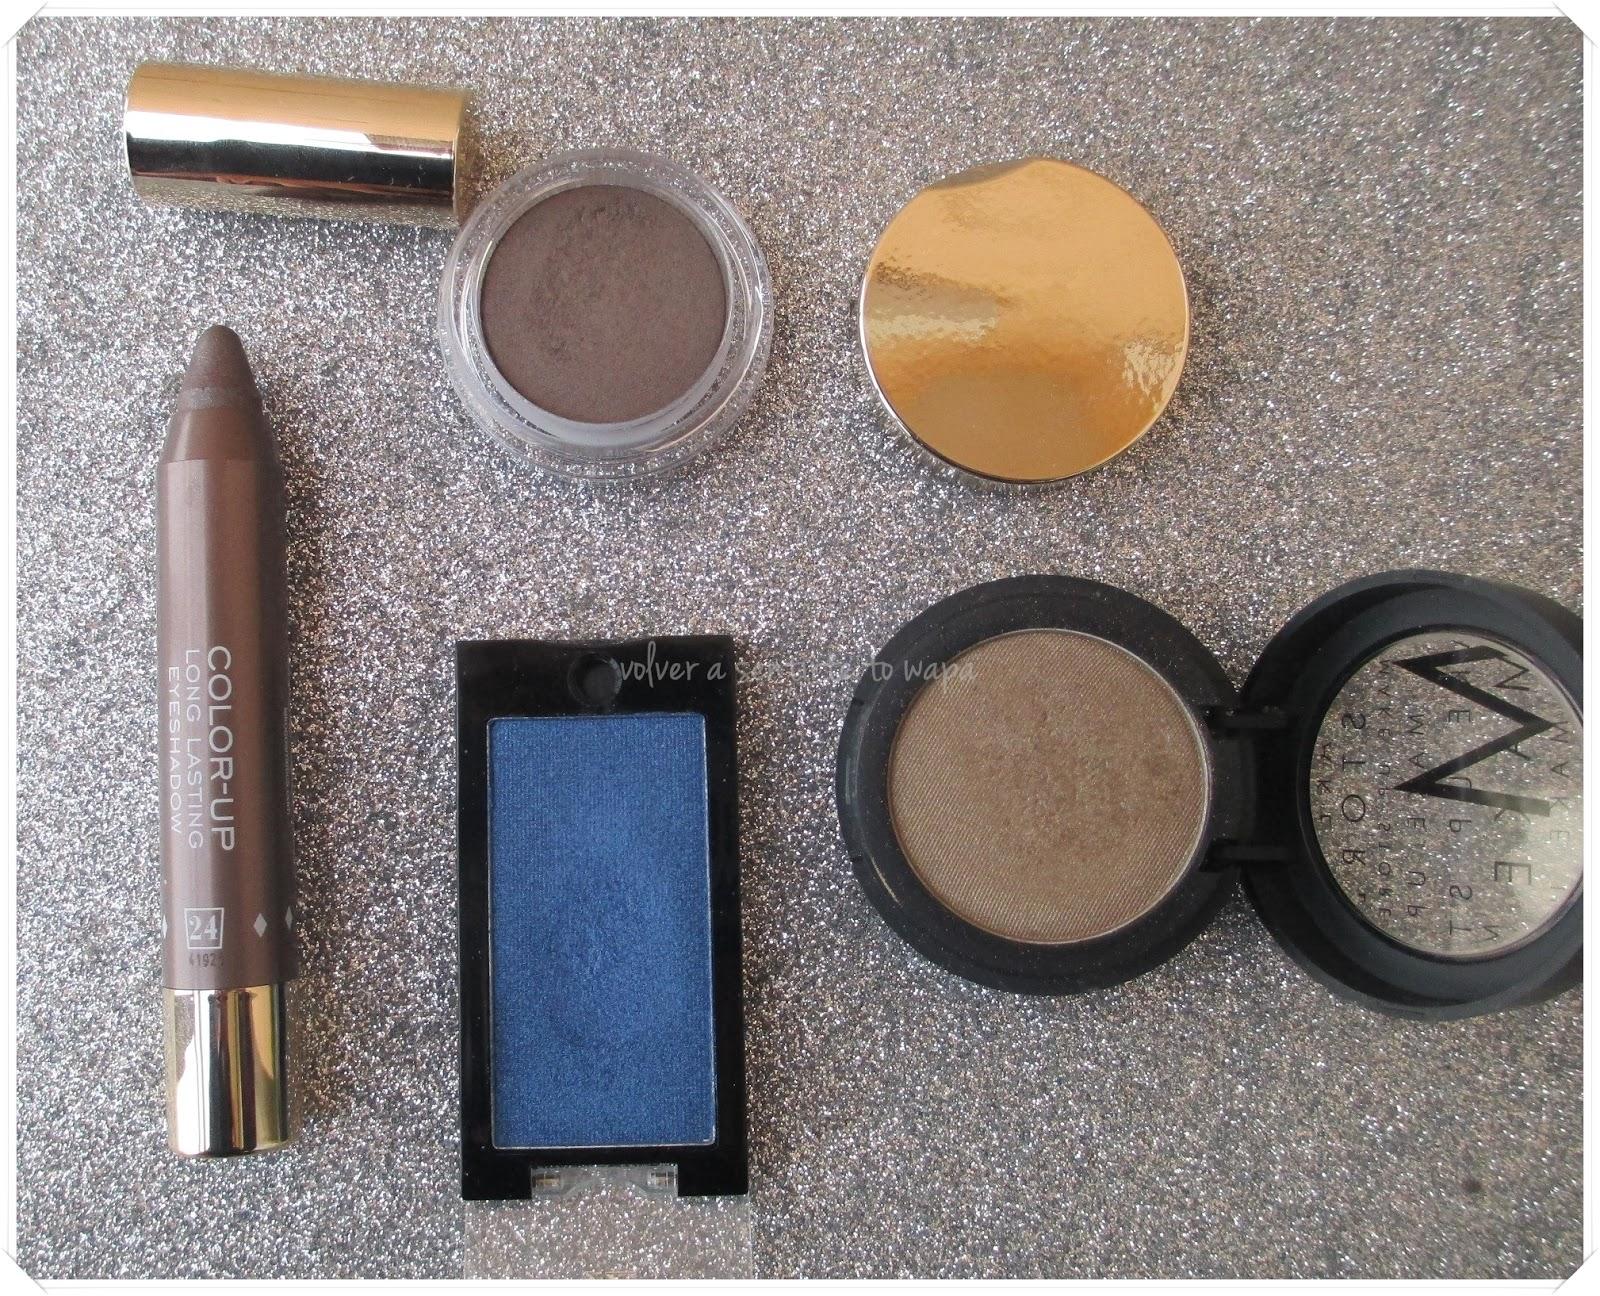 Favoritos de Maquillaje del 2014 - Sombras de Ojos - Volver a Sentirte to Wapa